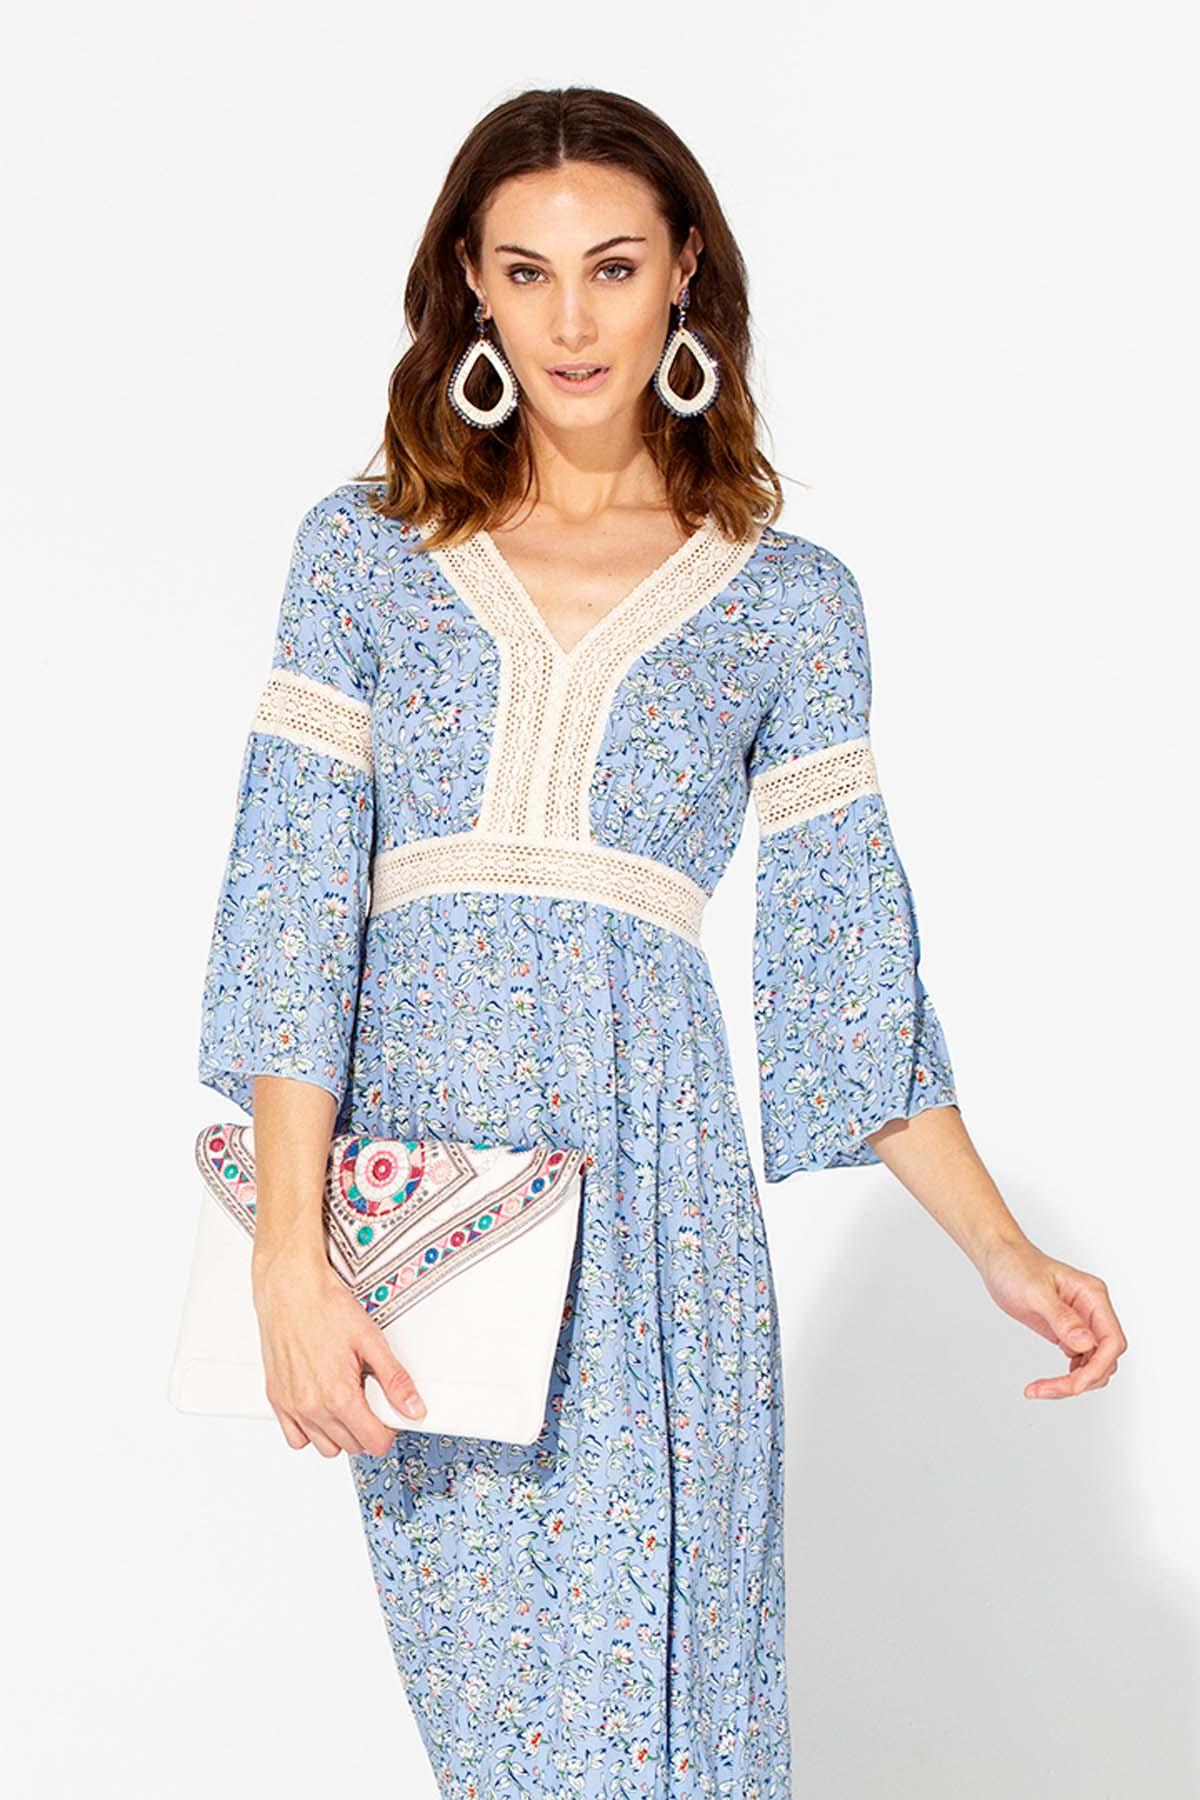 Vestido largo de crochet Teria Yabar - Vestido largo de crochet